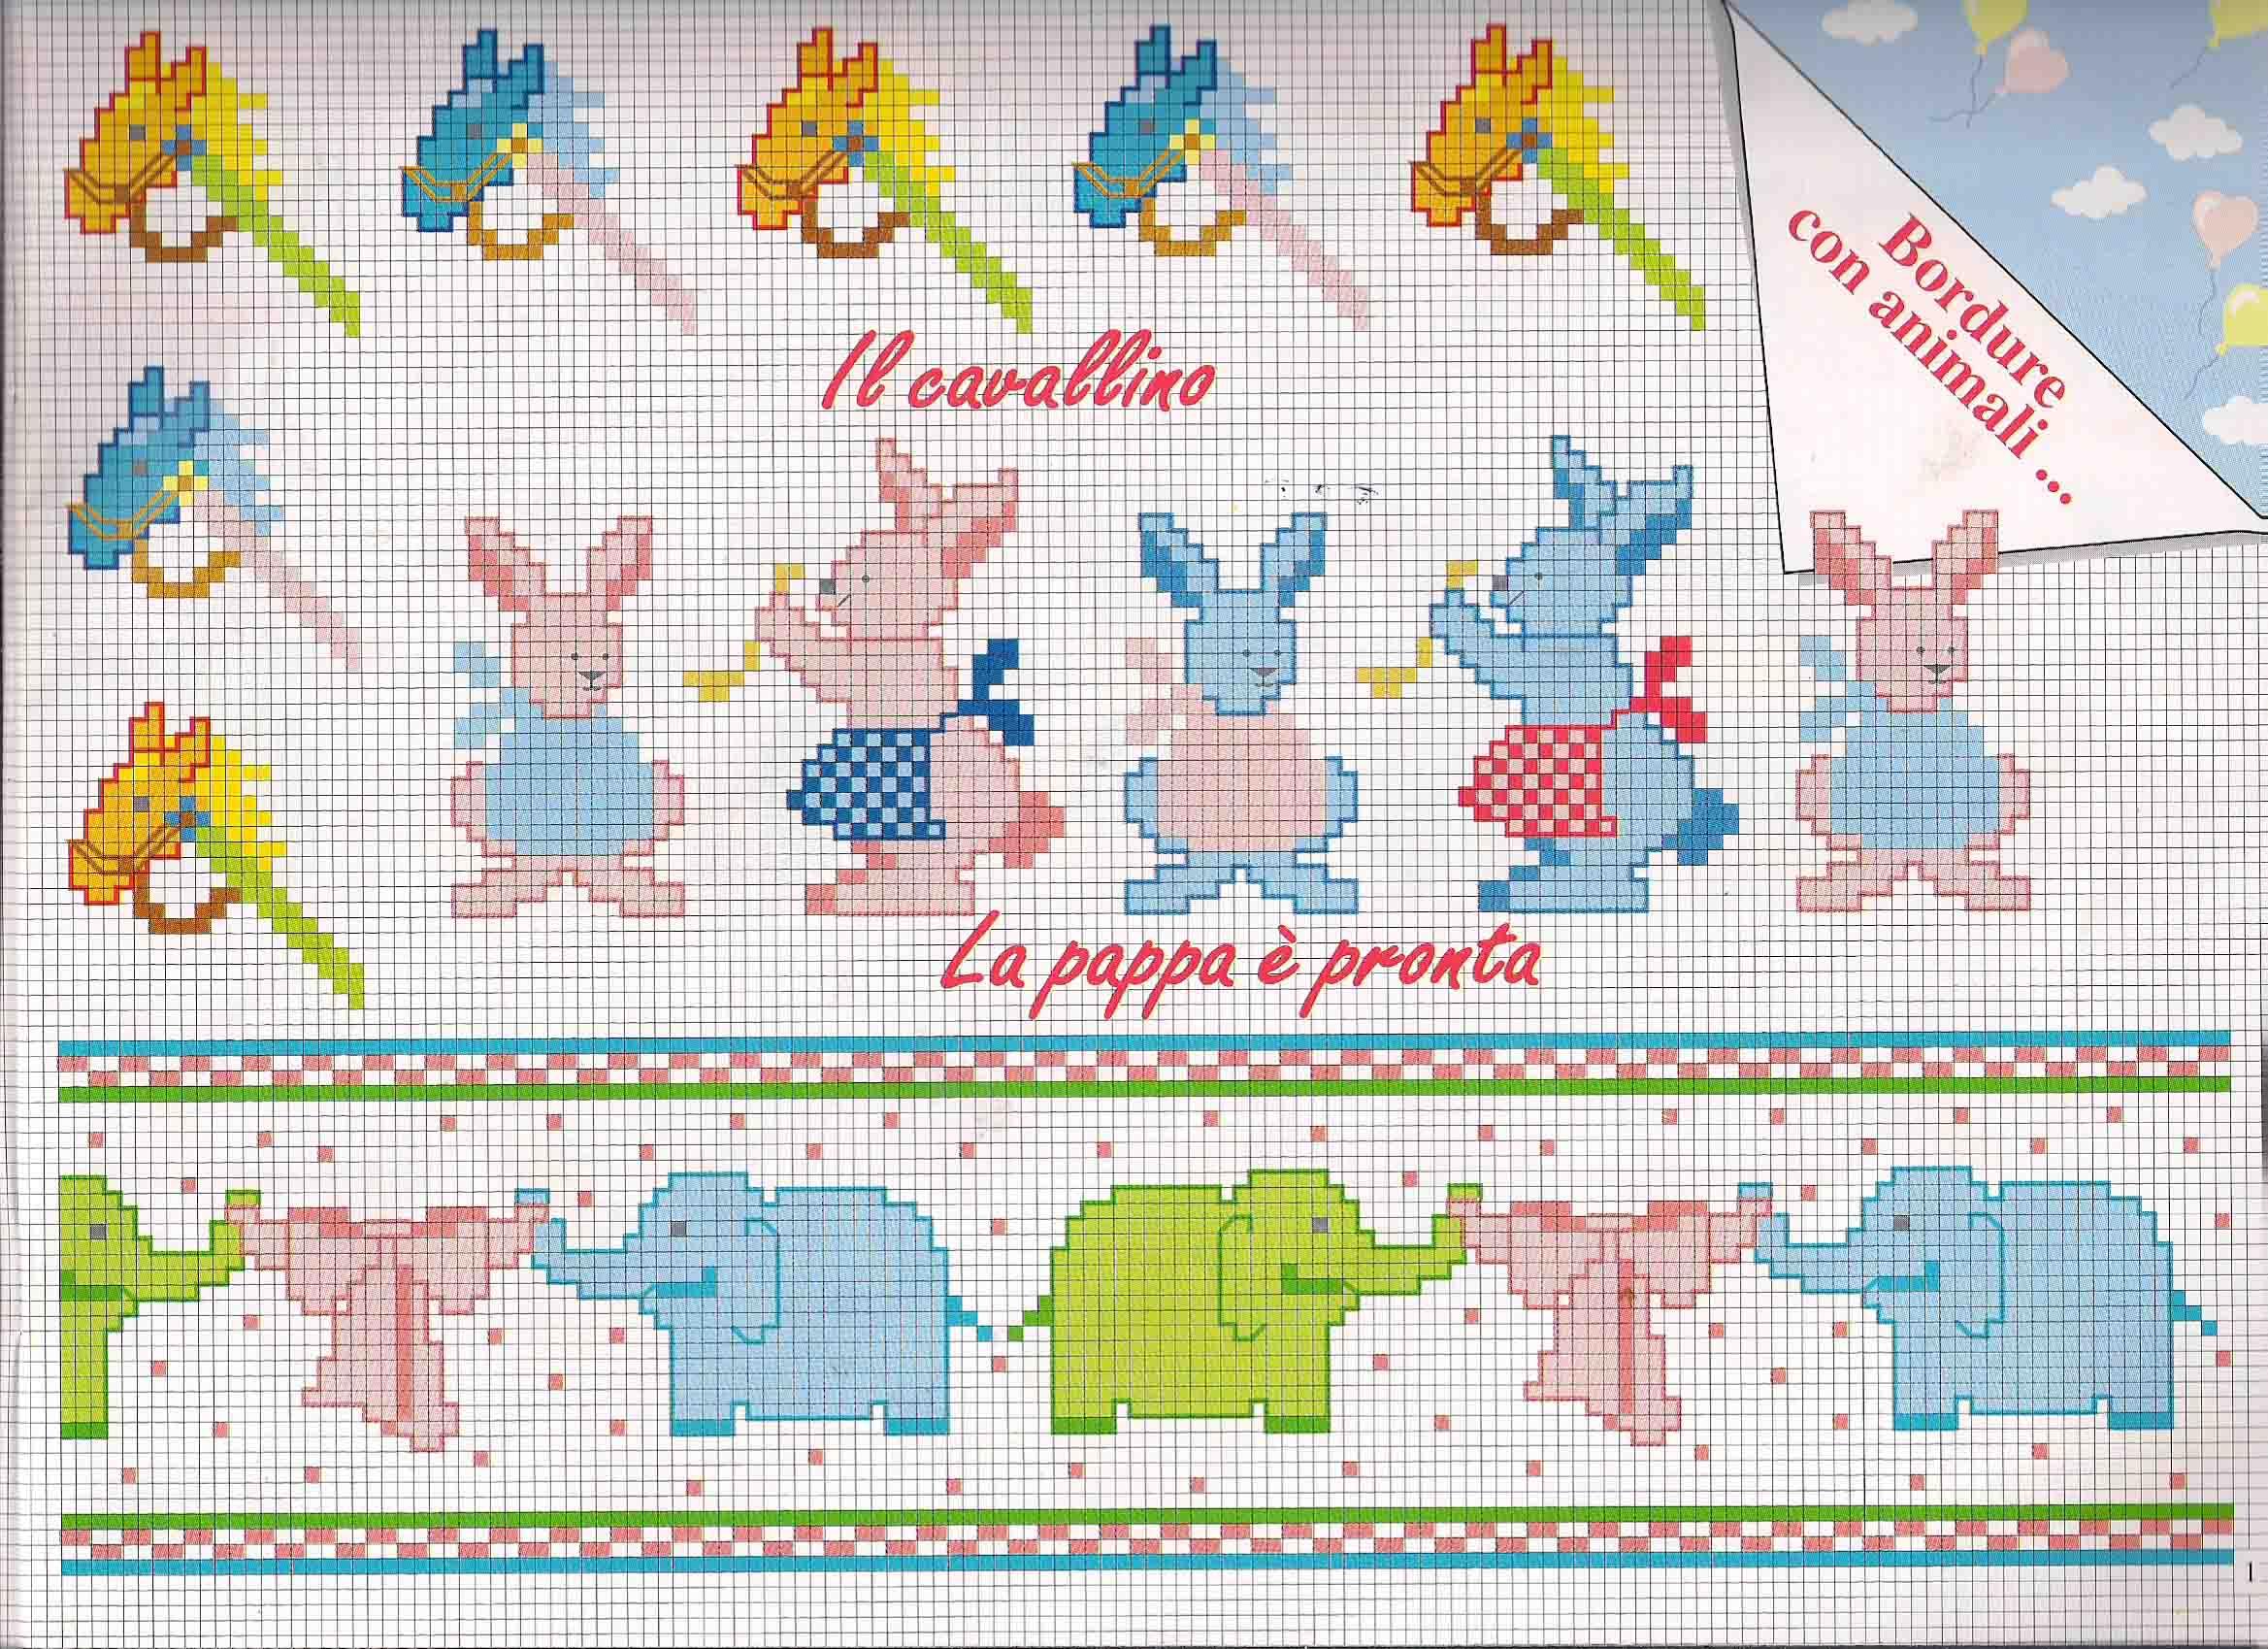 Bordi punto croce bimbi cavalli conigli elefanti for Punto croce bimbi schemi